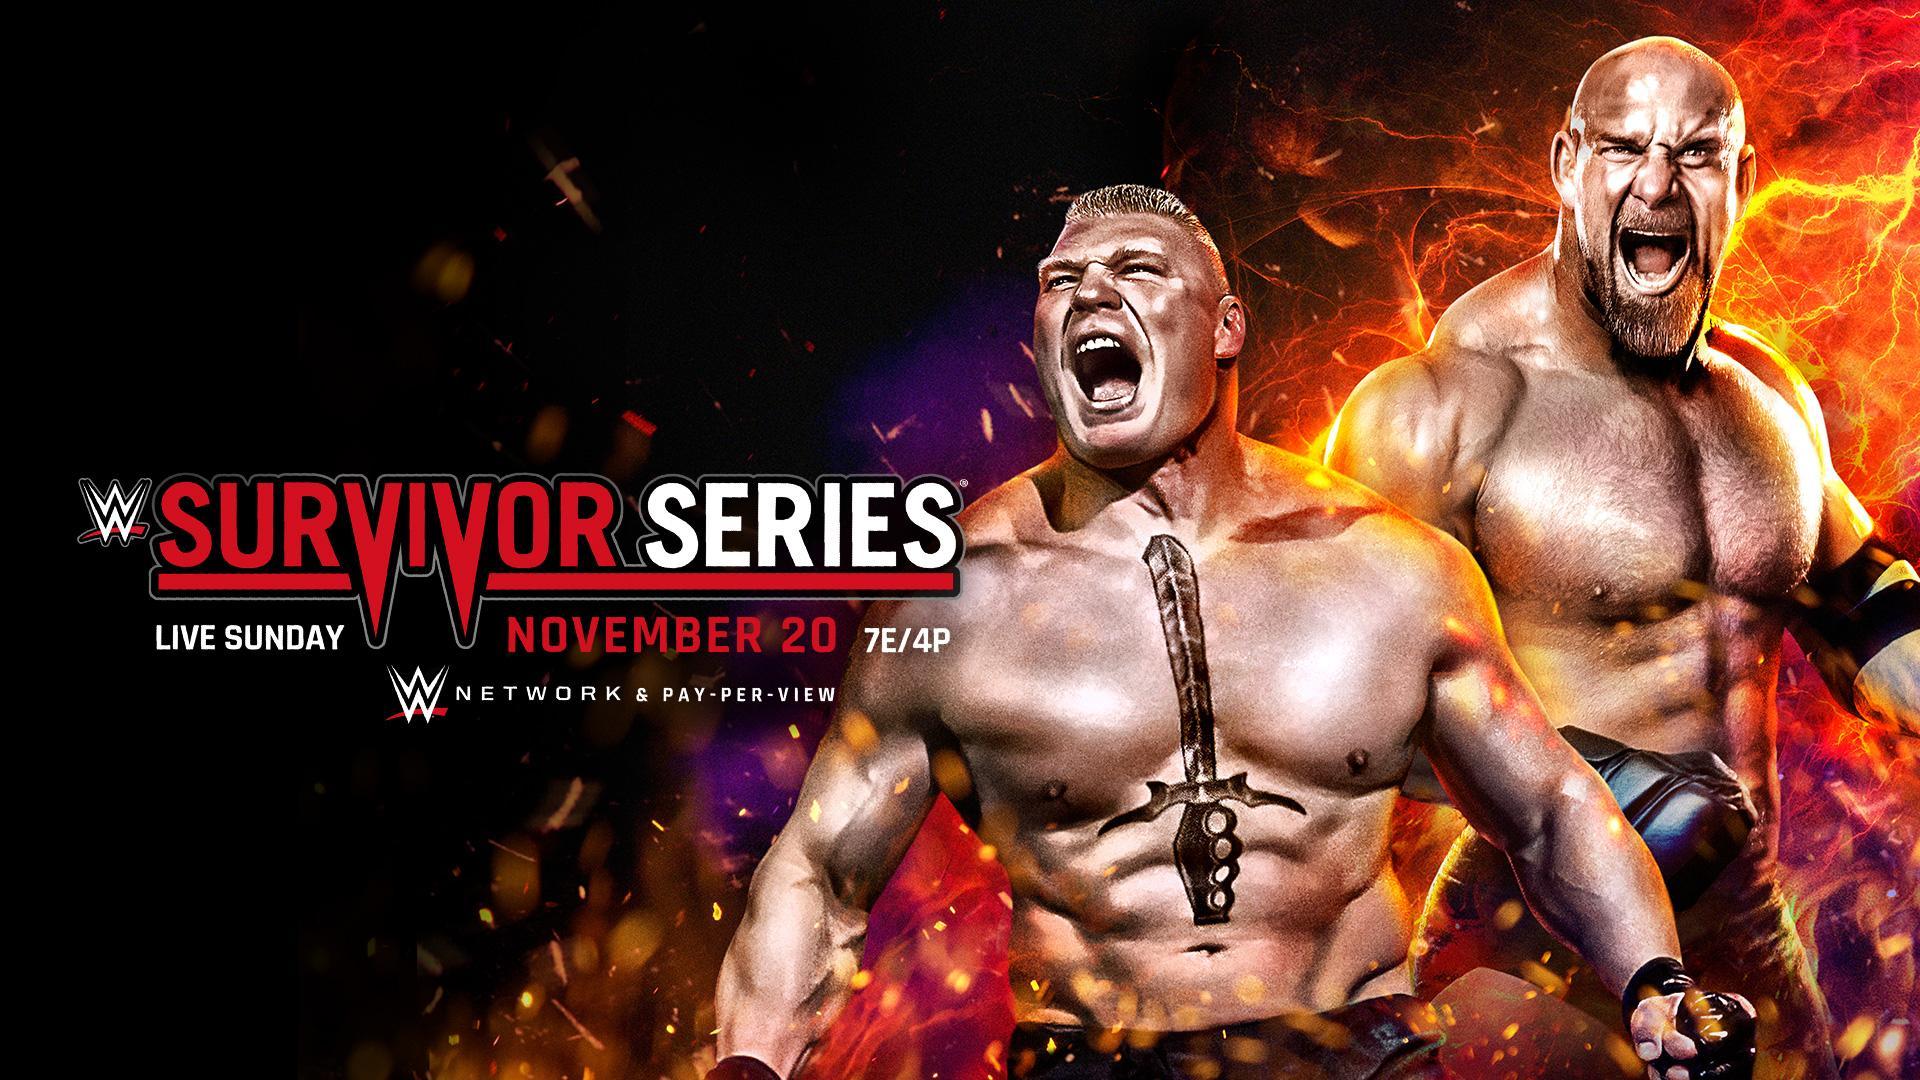 Wwe Survivor Series 2016 Results Goldberg Vs Brock Lesnar